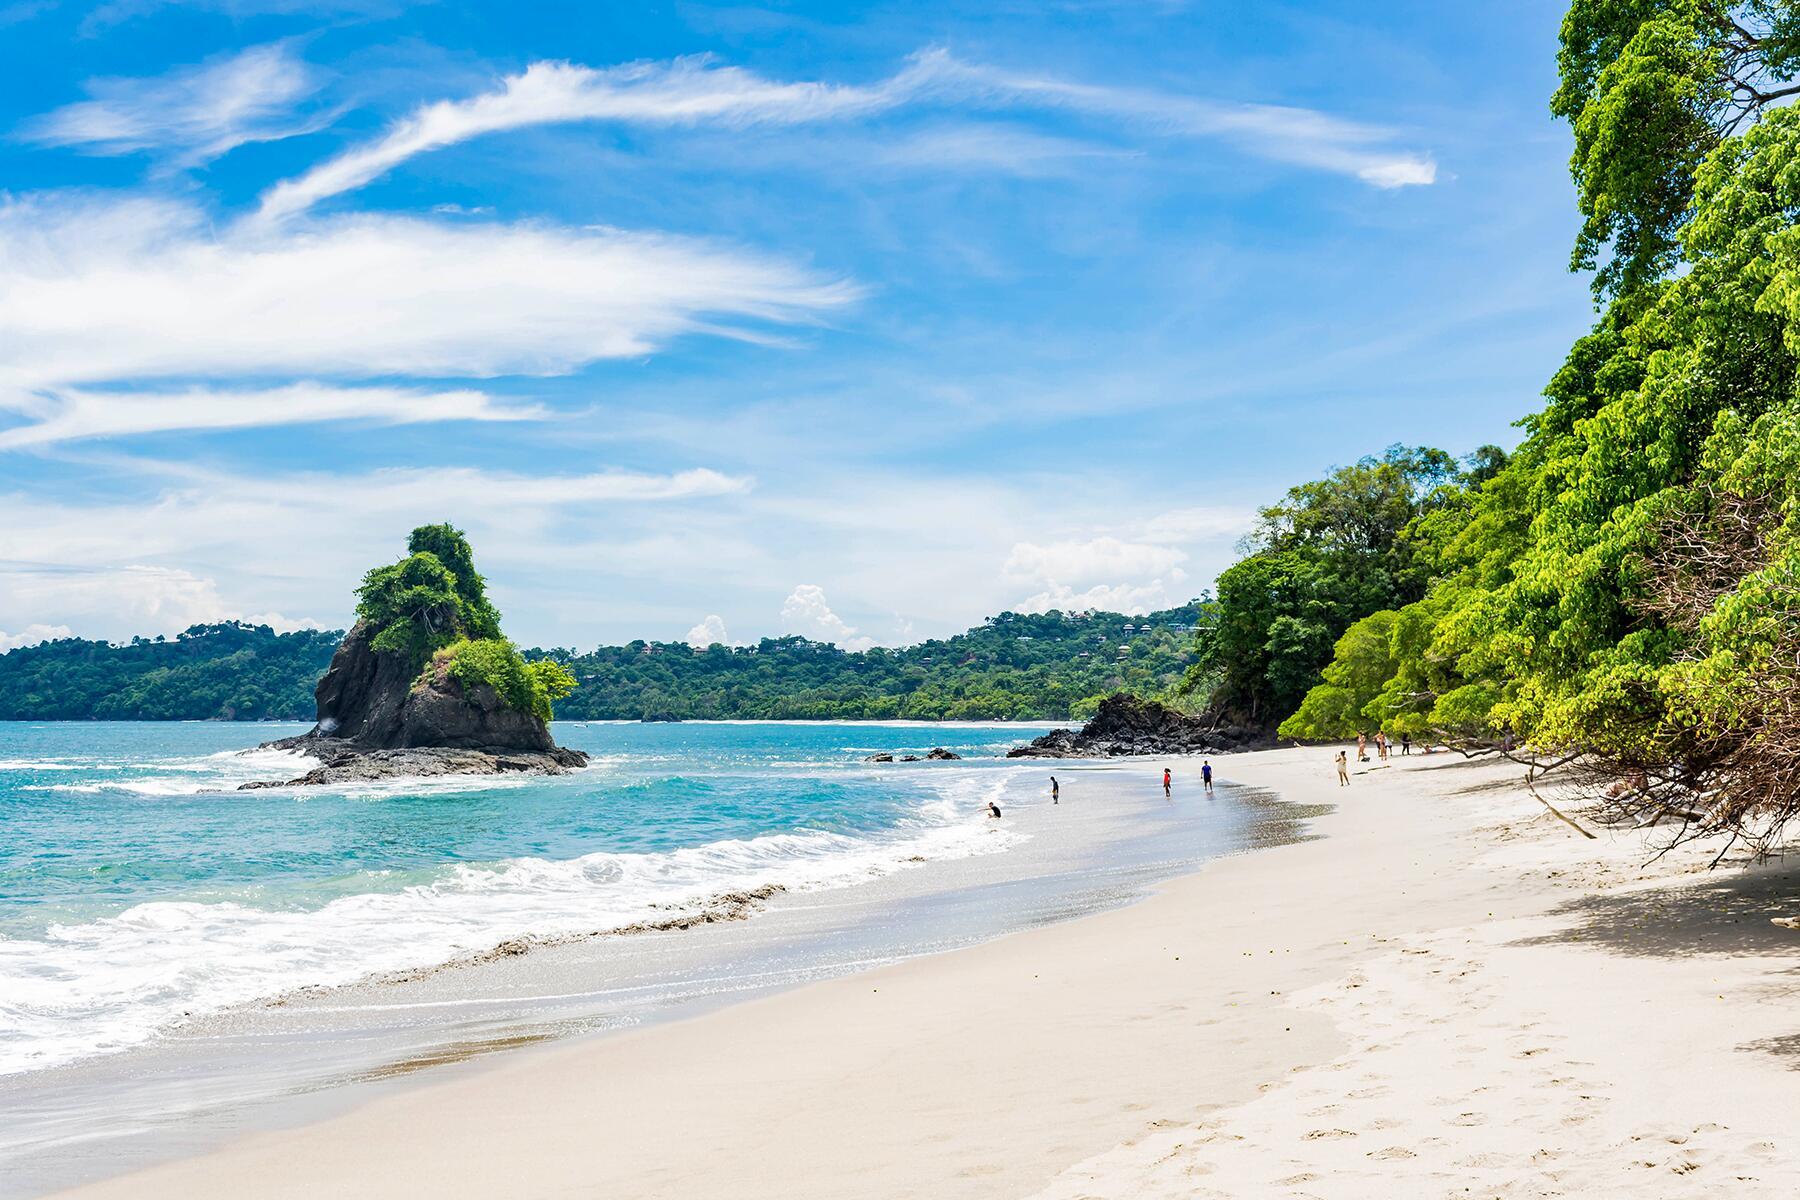 Espadilla Beach arguably the most famous beach in Costa Rica.